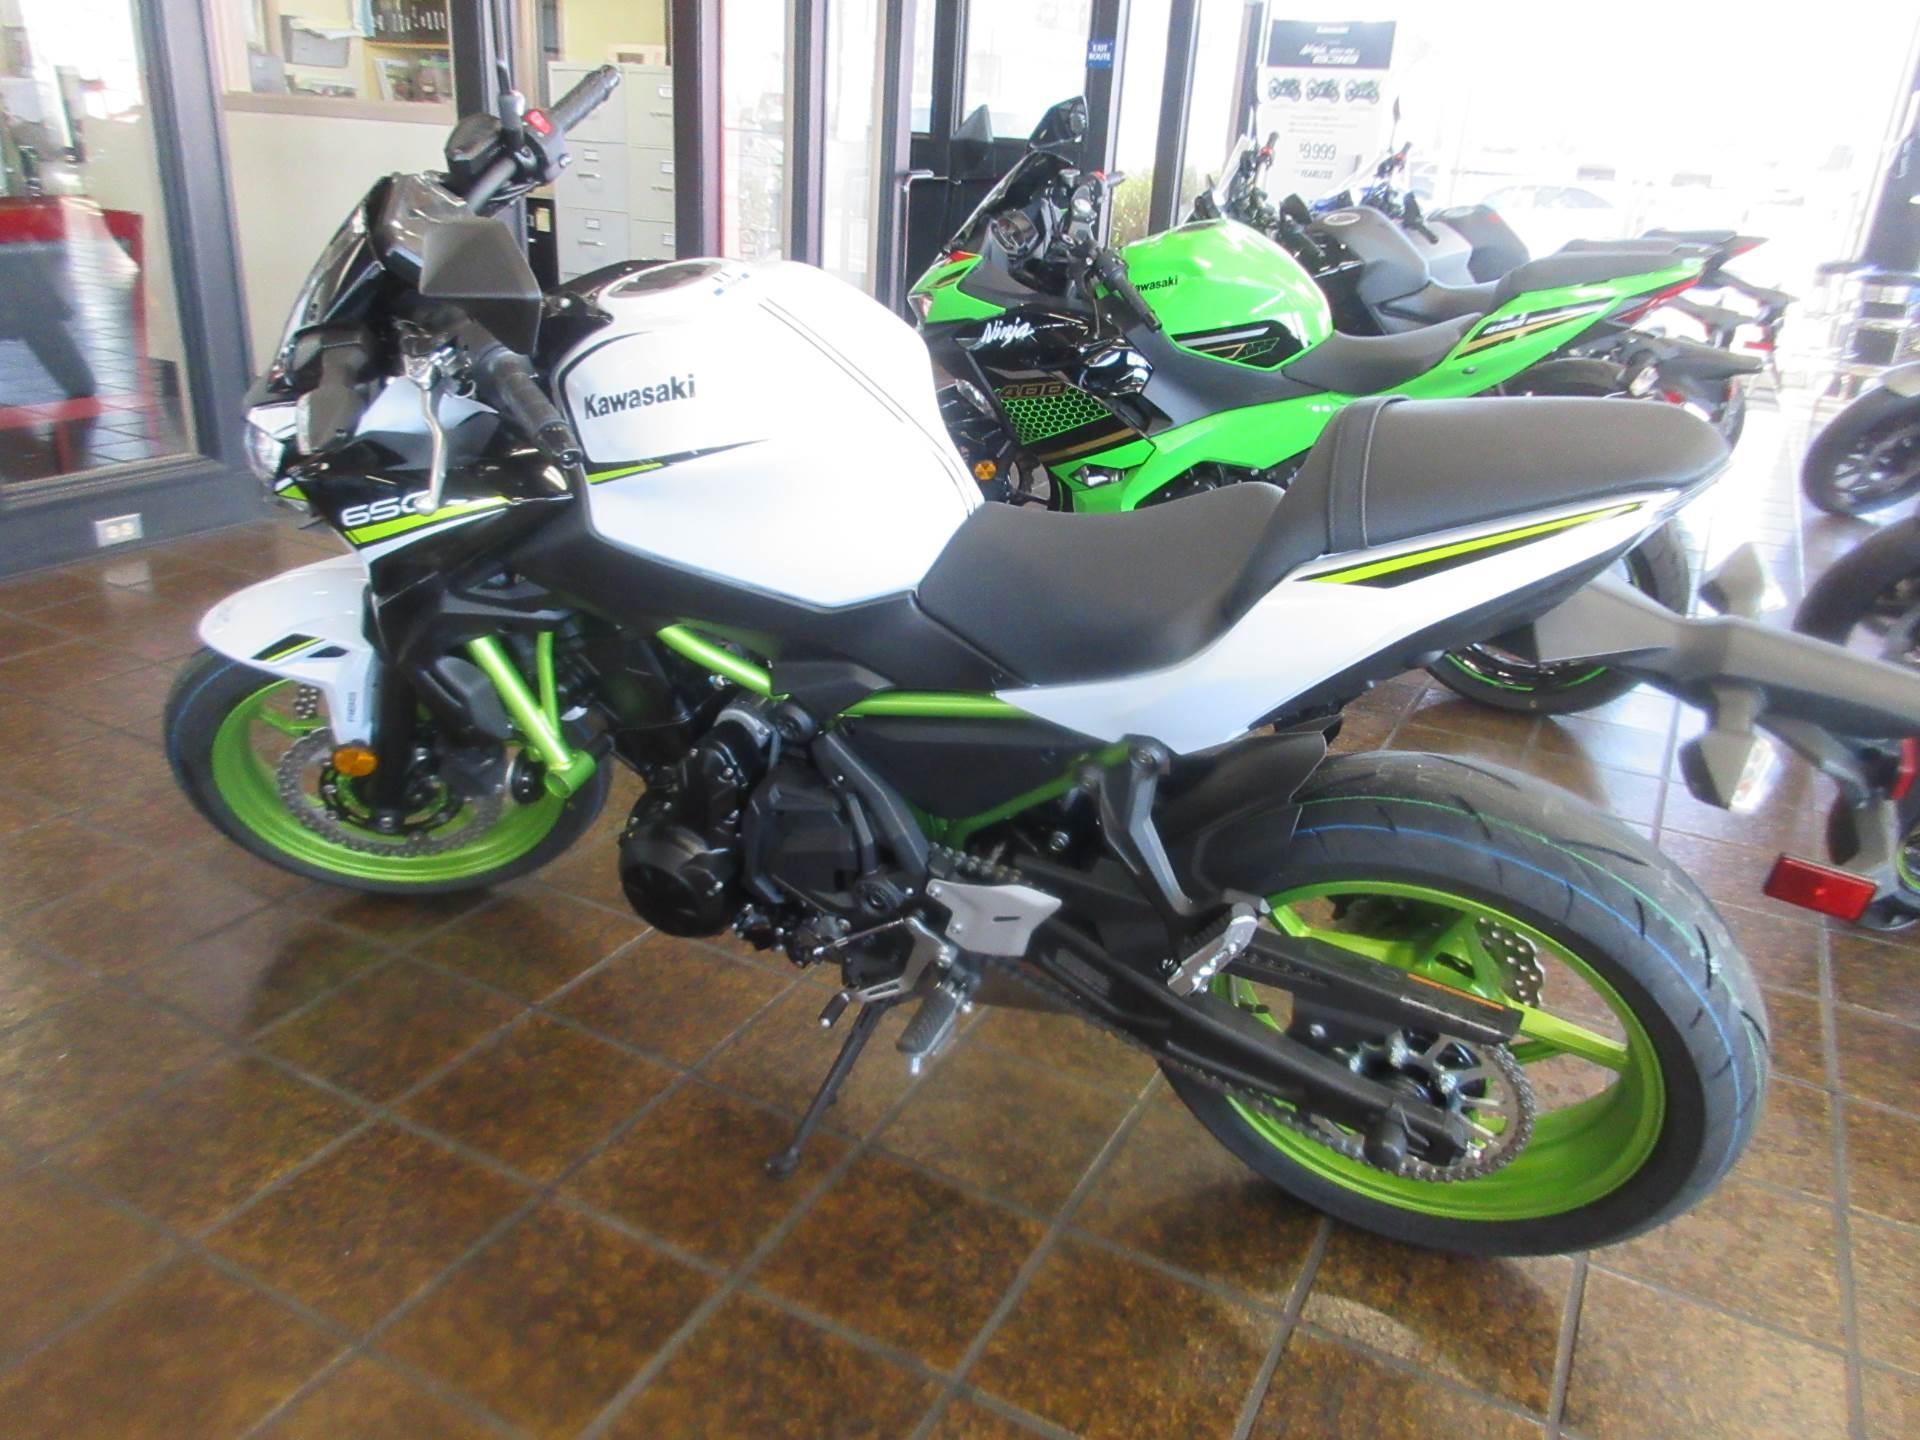 New 2021 Kawasaki Z650 ABS powersports in Salinas, CA